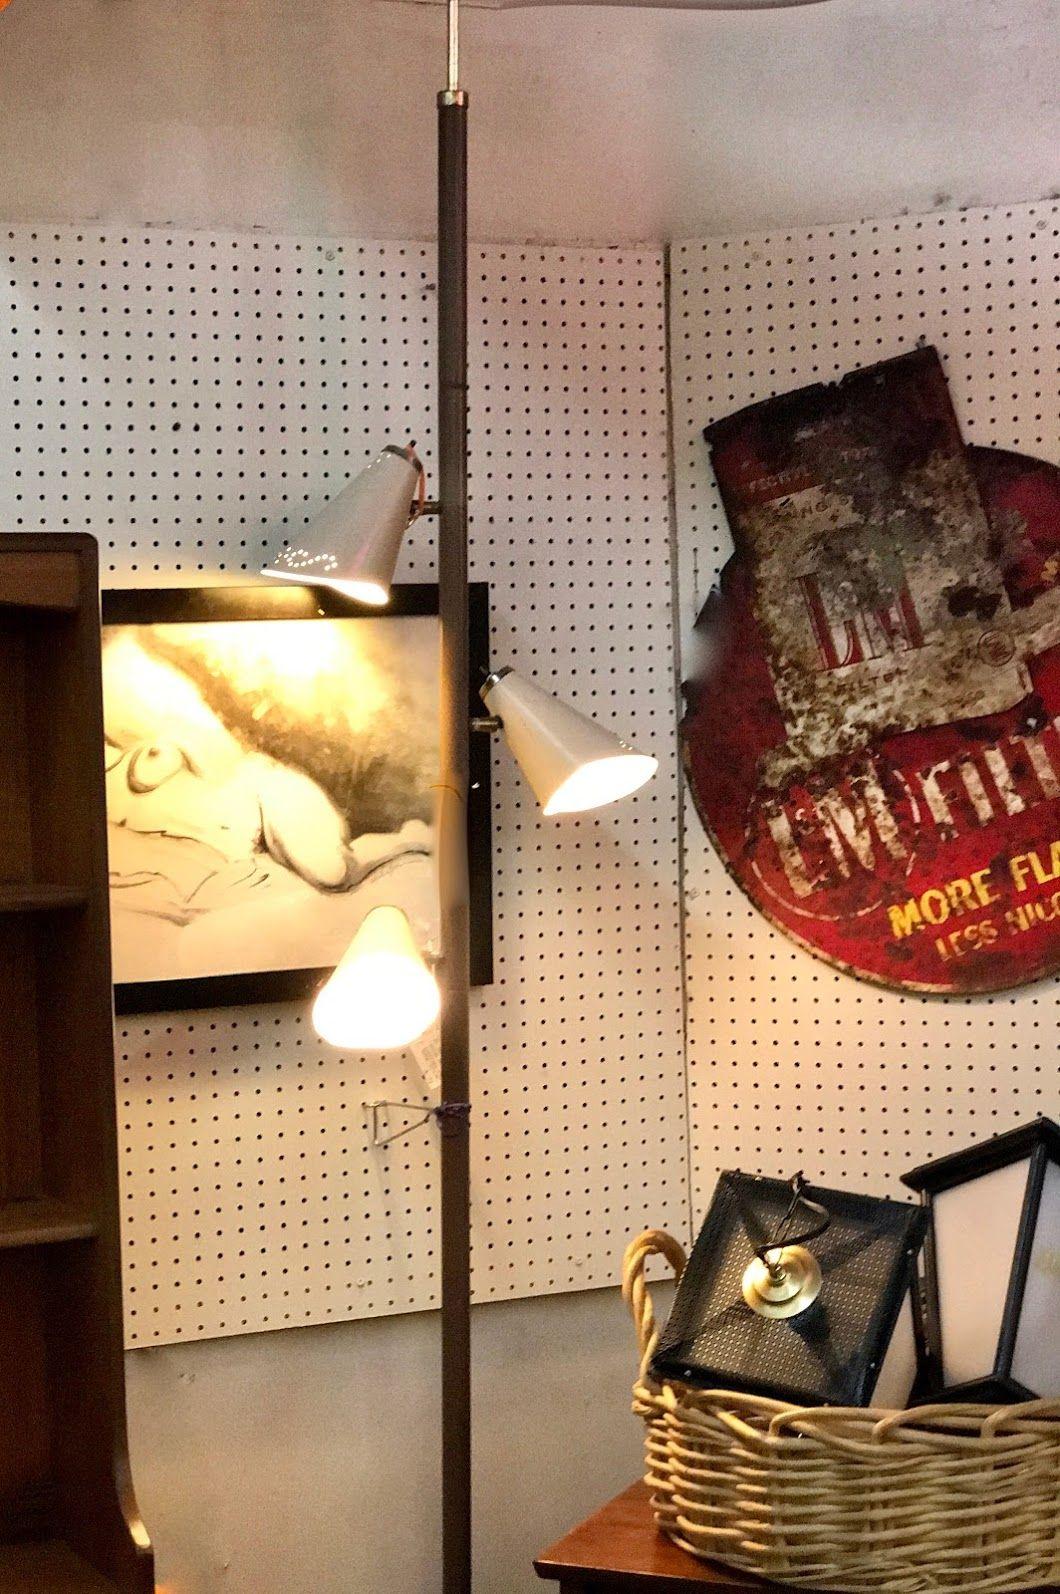 Vintage Tension Pole Floor Lamp $75 Mid Century Dallas Booth 766 Lula B's 1010 N. Riverfront Blvd. Dallas, TX 75207